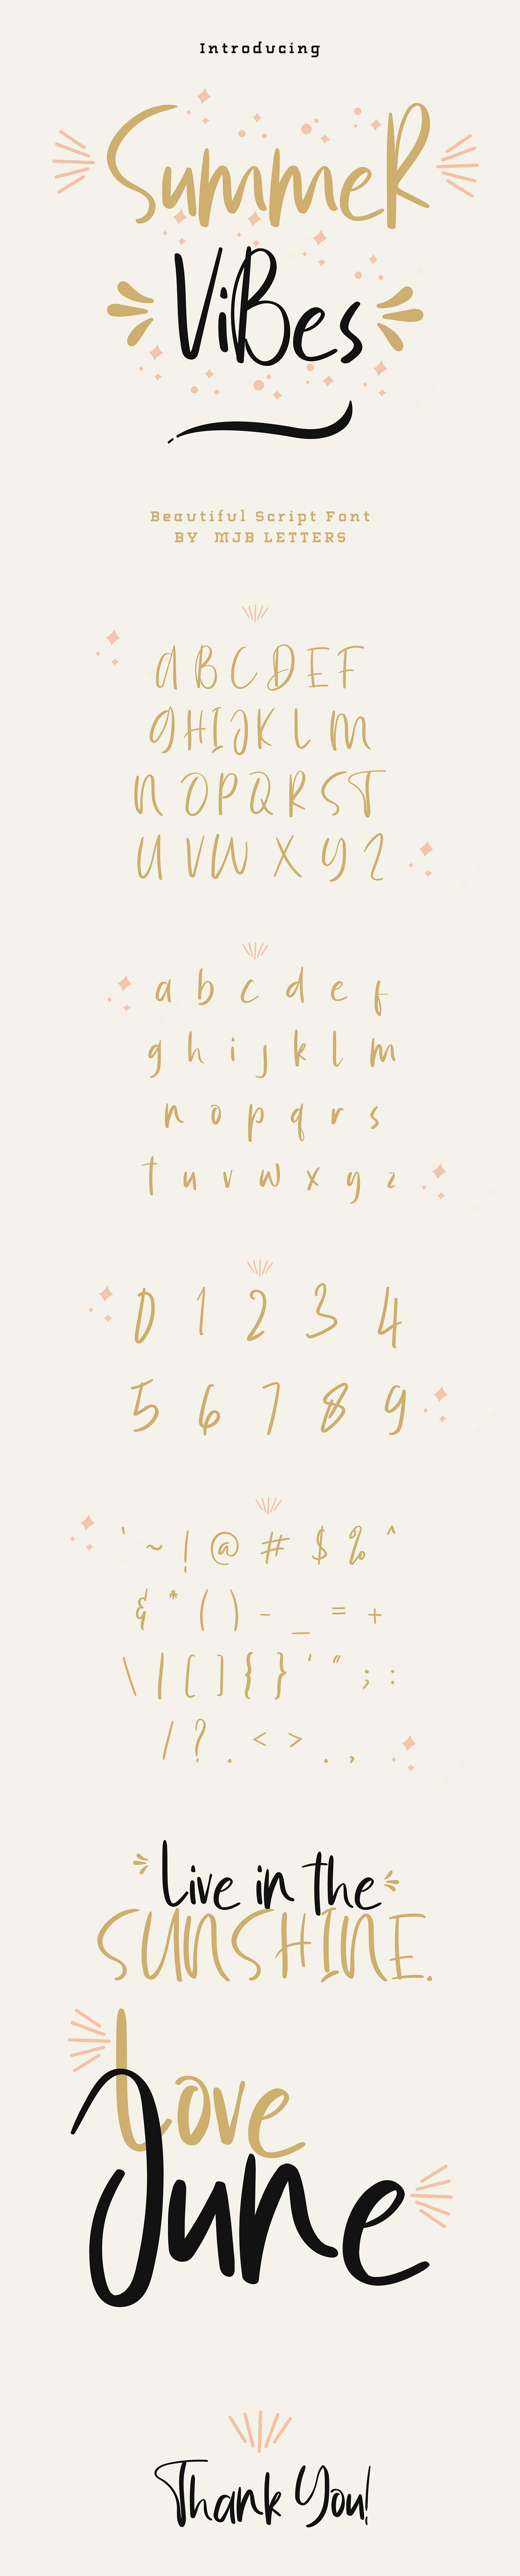 beautiful fonts download fonts free fonts freebies lettering fonts script fonts